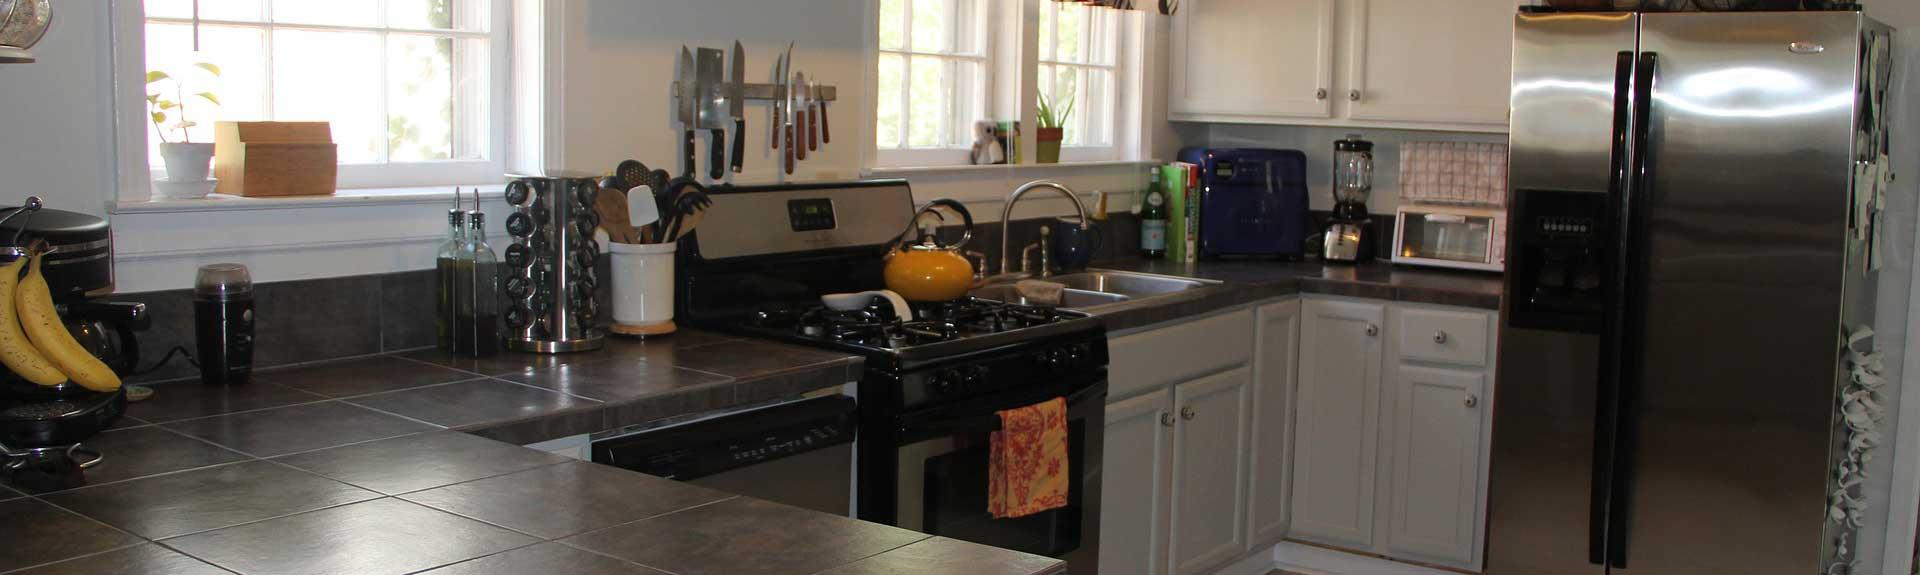 immobilien makler aus und in kleve arden immobilien. Black Bedroom Furniture Sets. Home Design Ideas